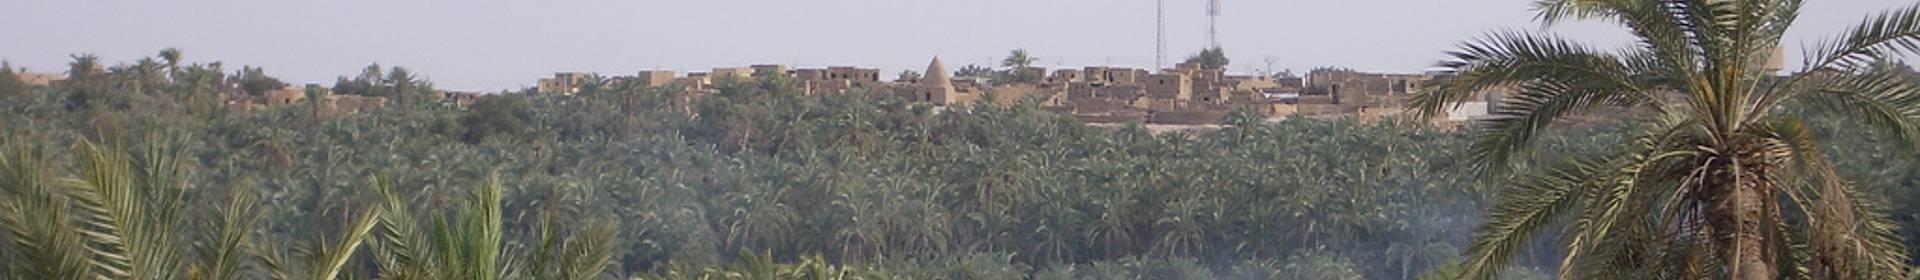 Al-Bahariya